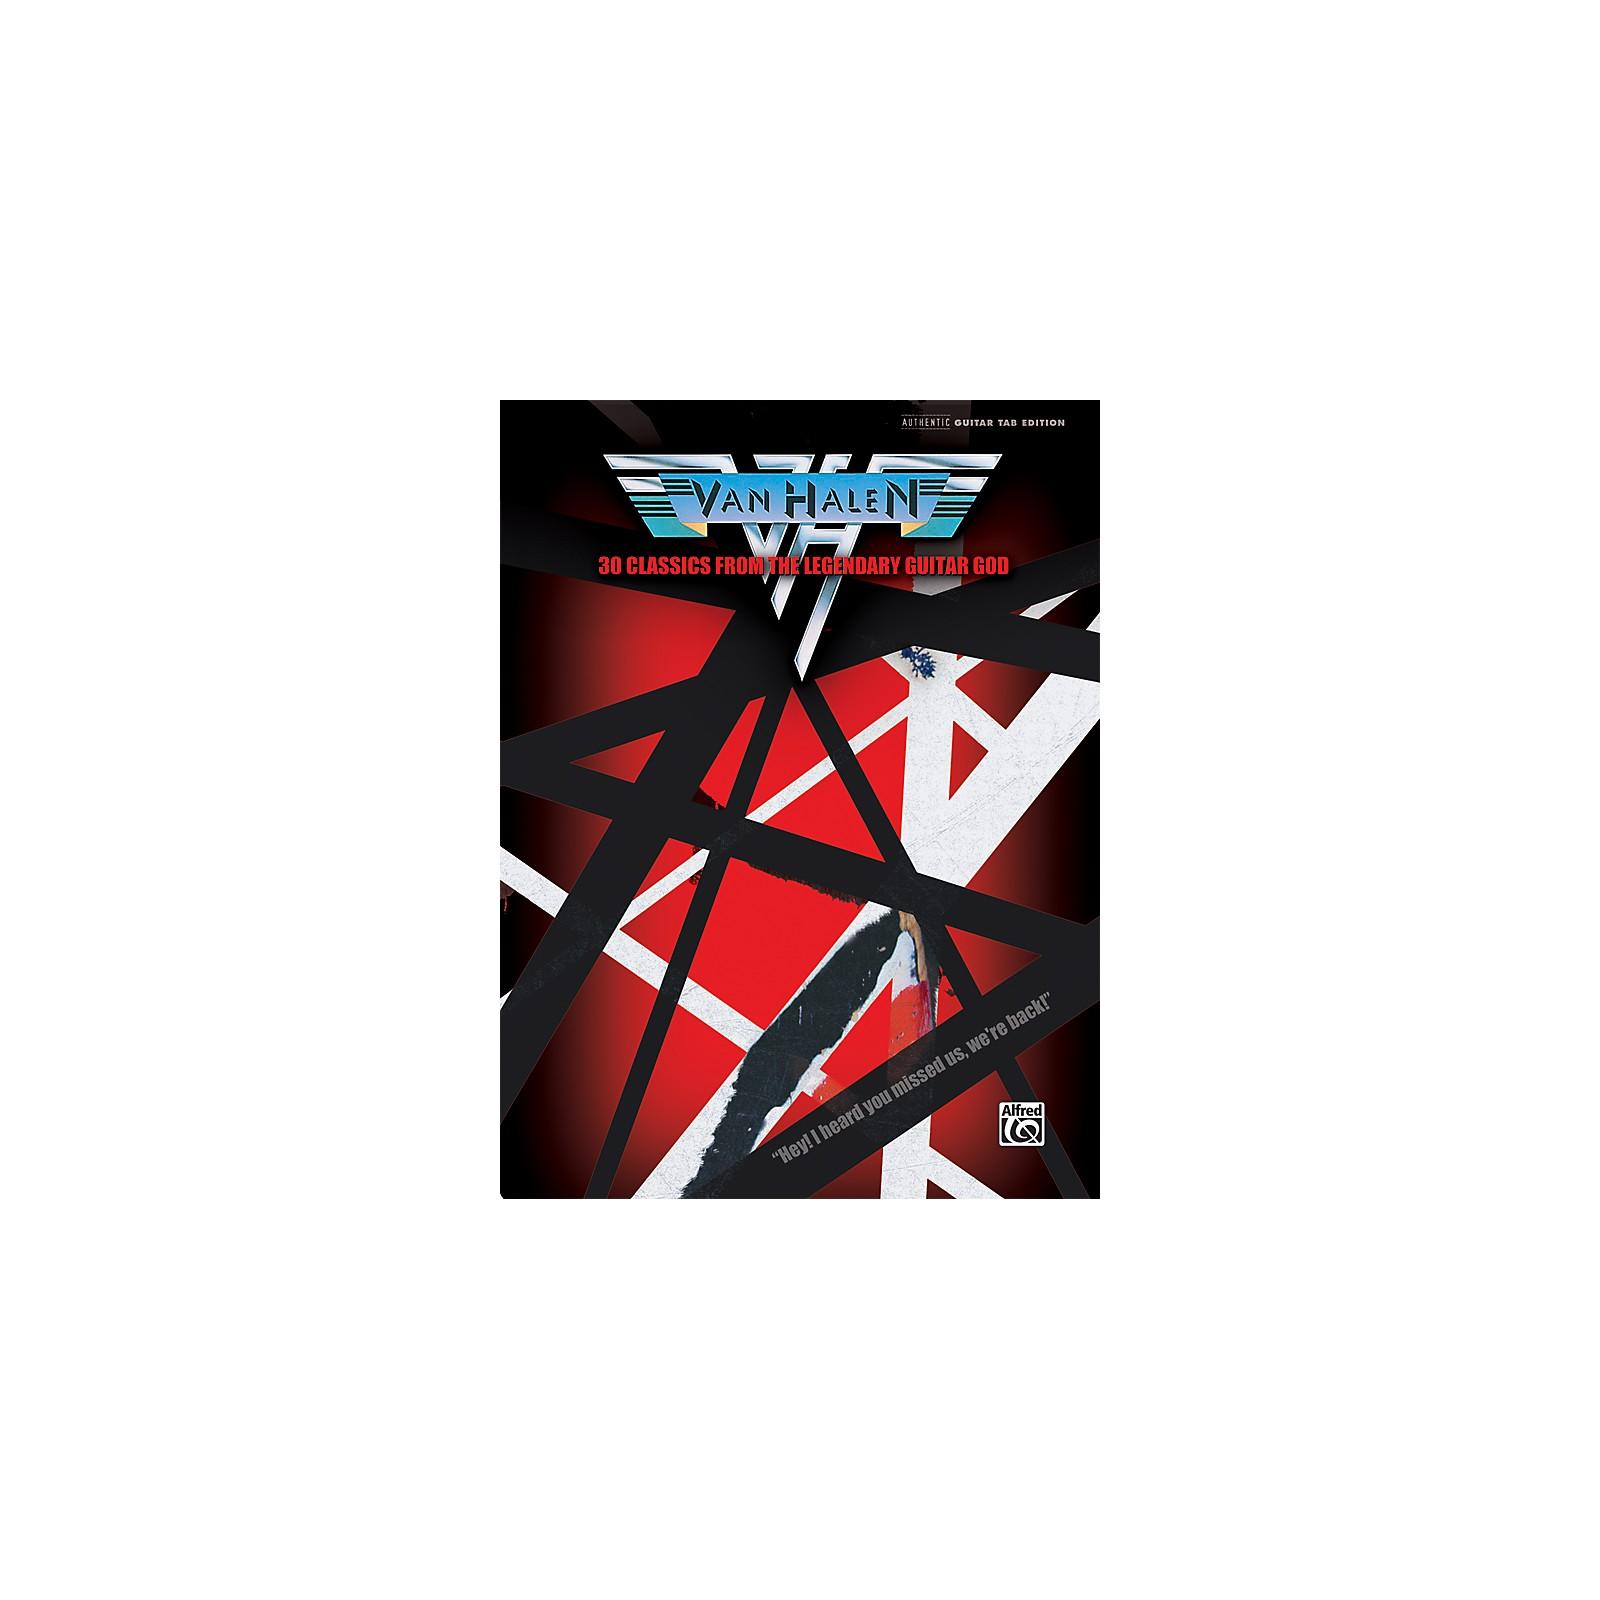 Alfred Van Halen 30 Classics from the Legendary Guitar God Guitar Tab Book